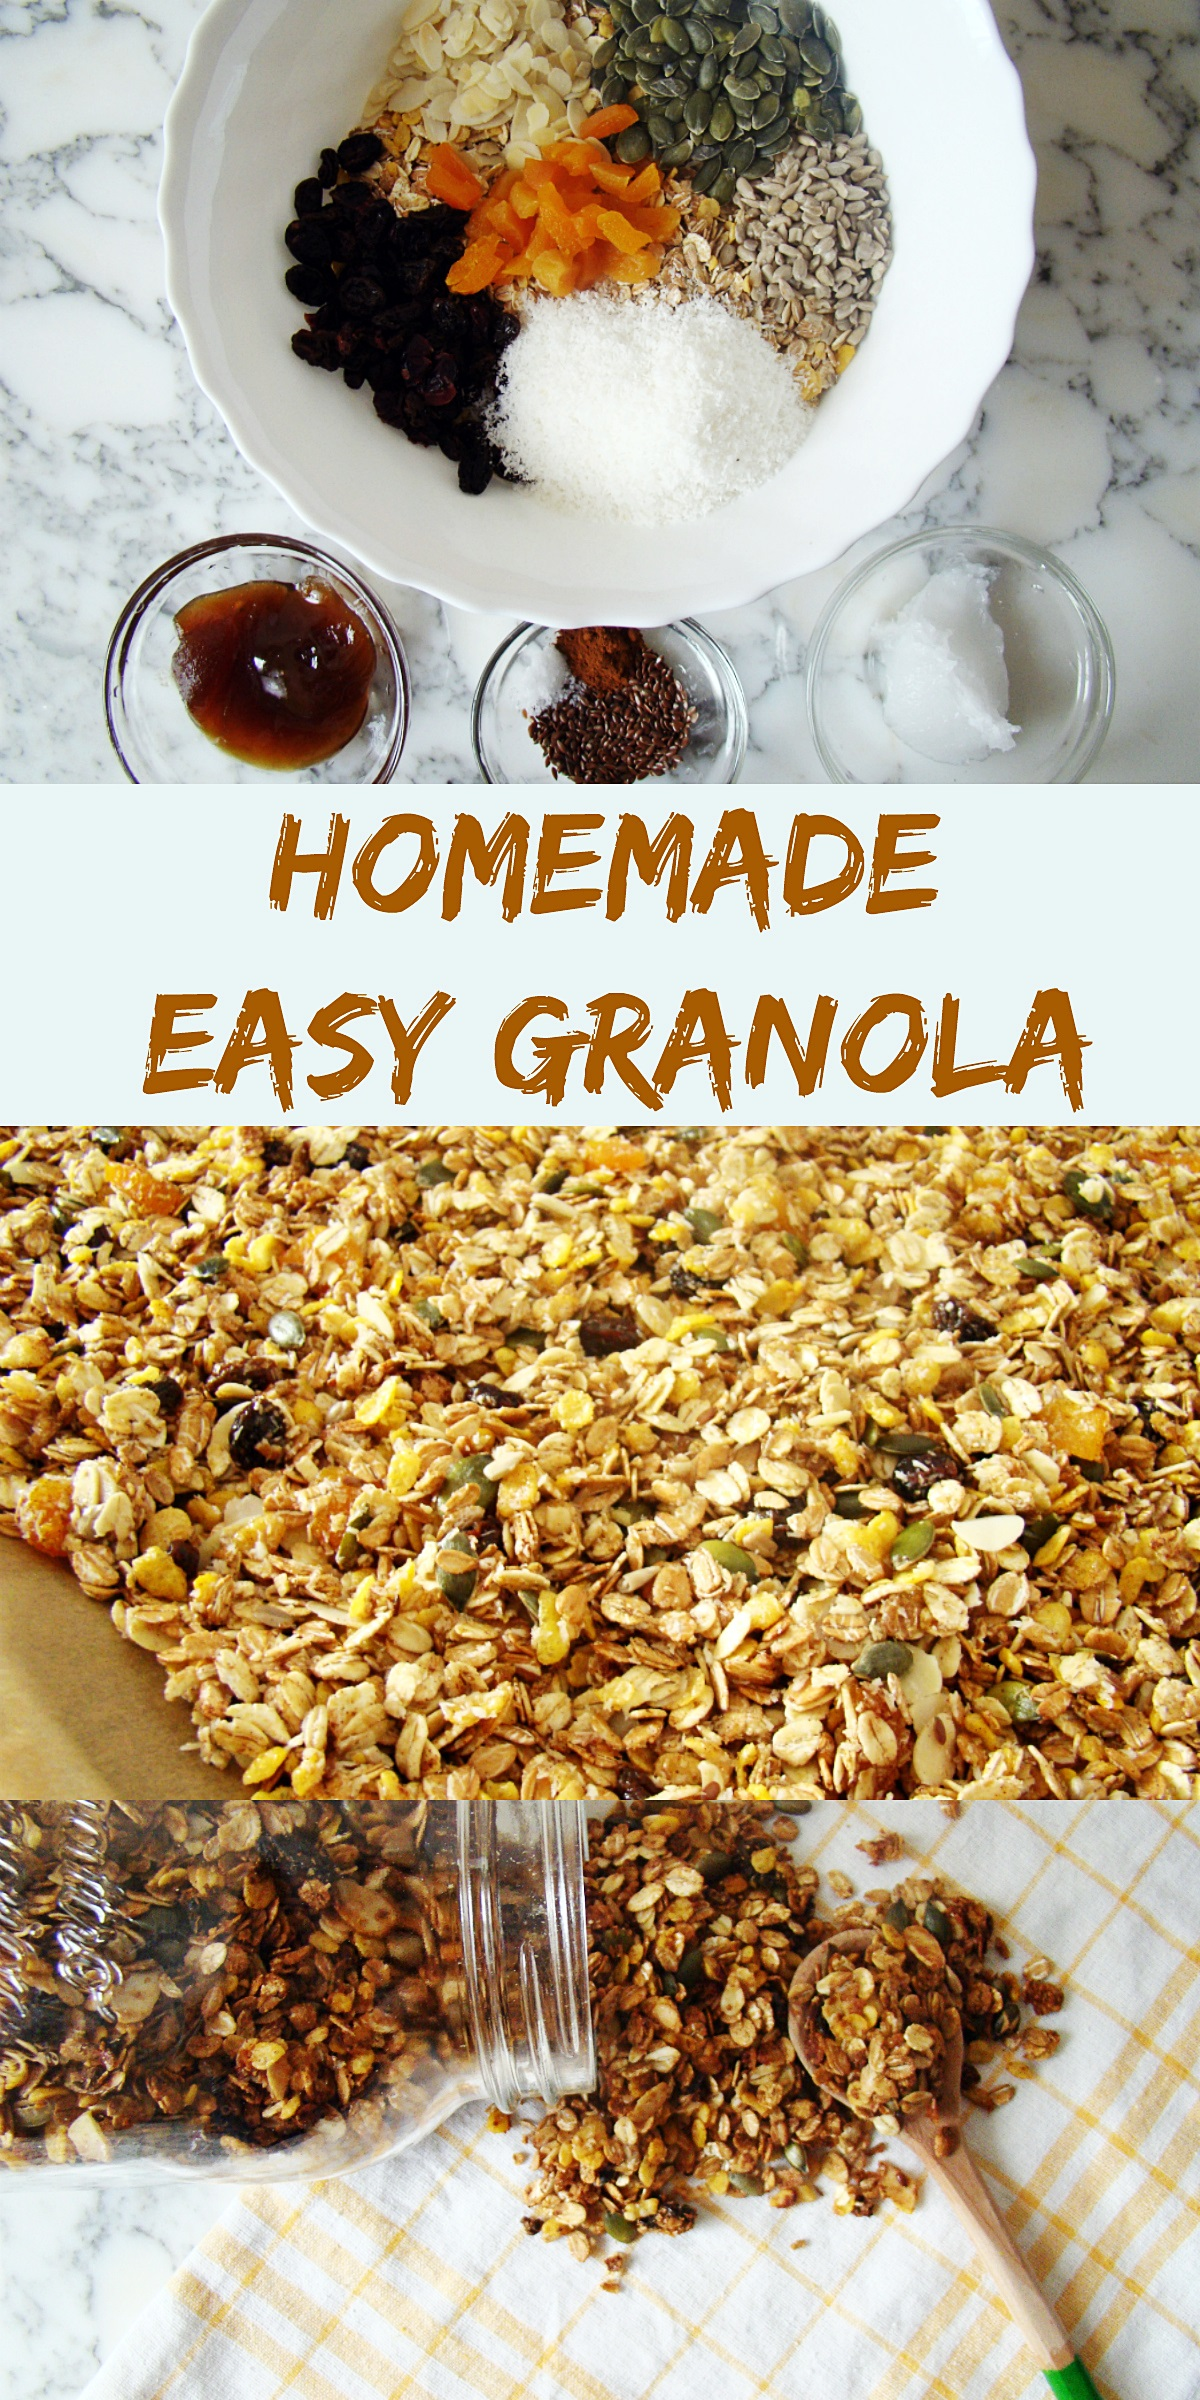 Homemade easy granola